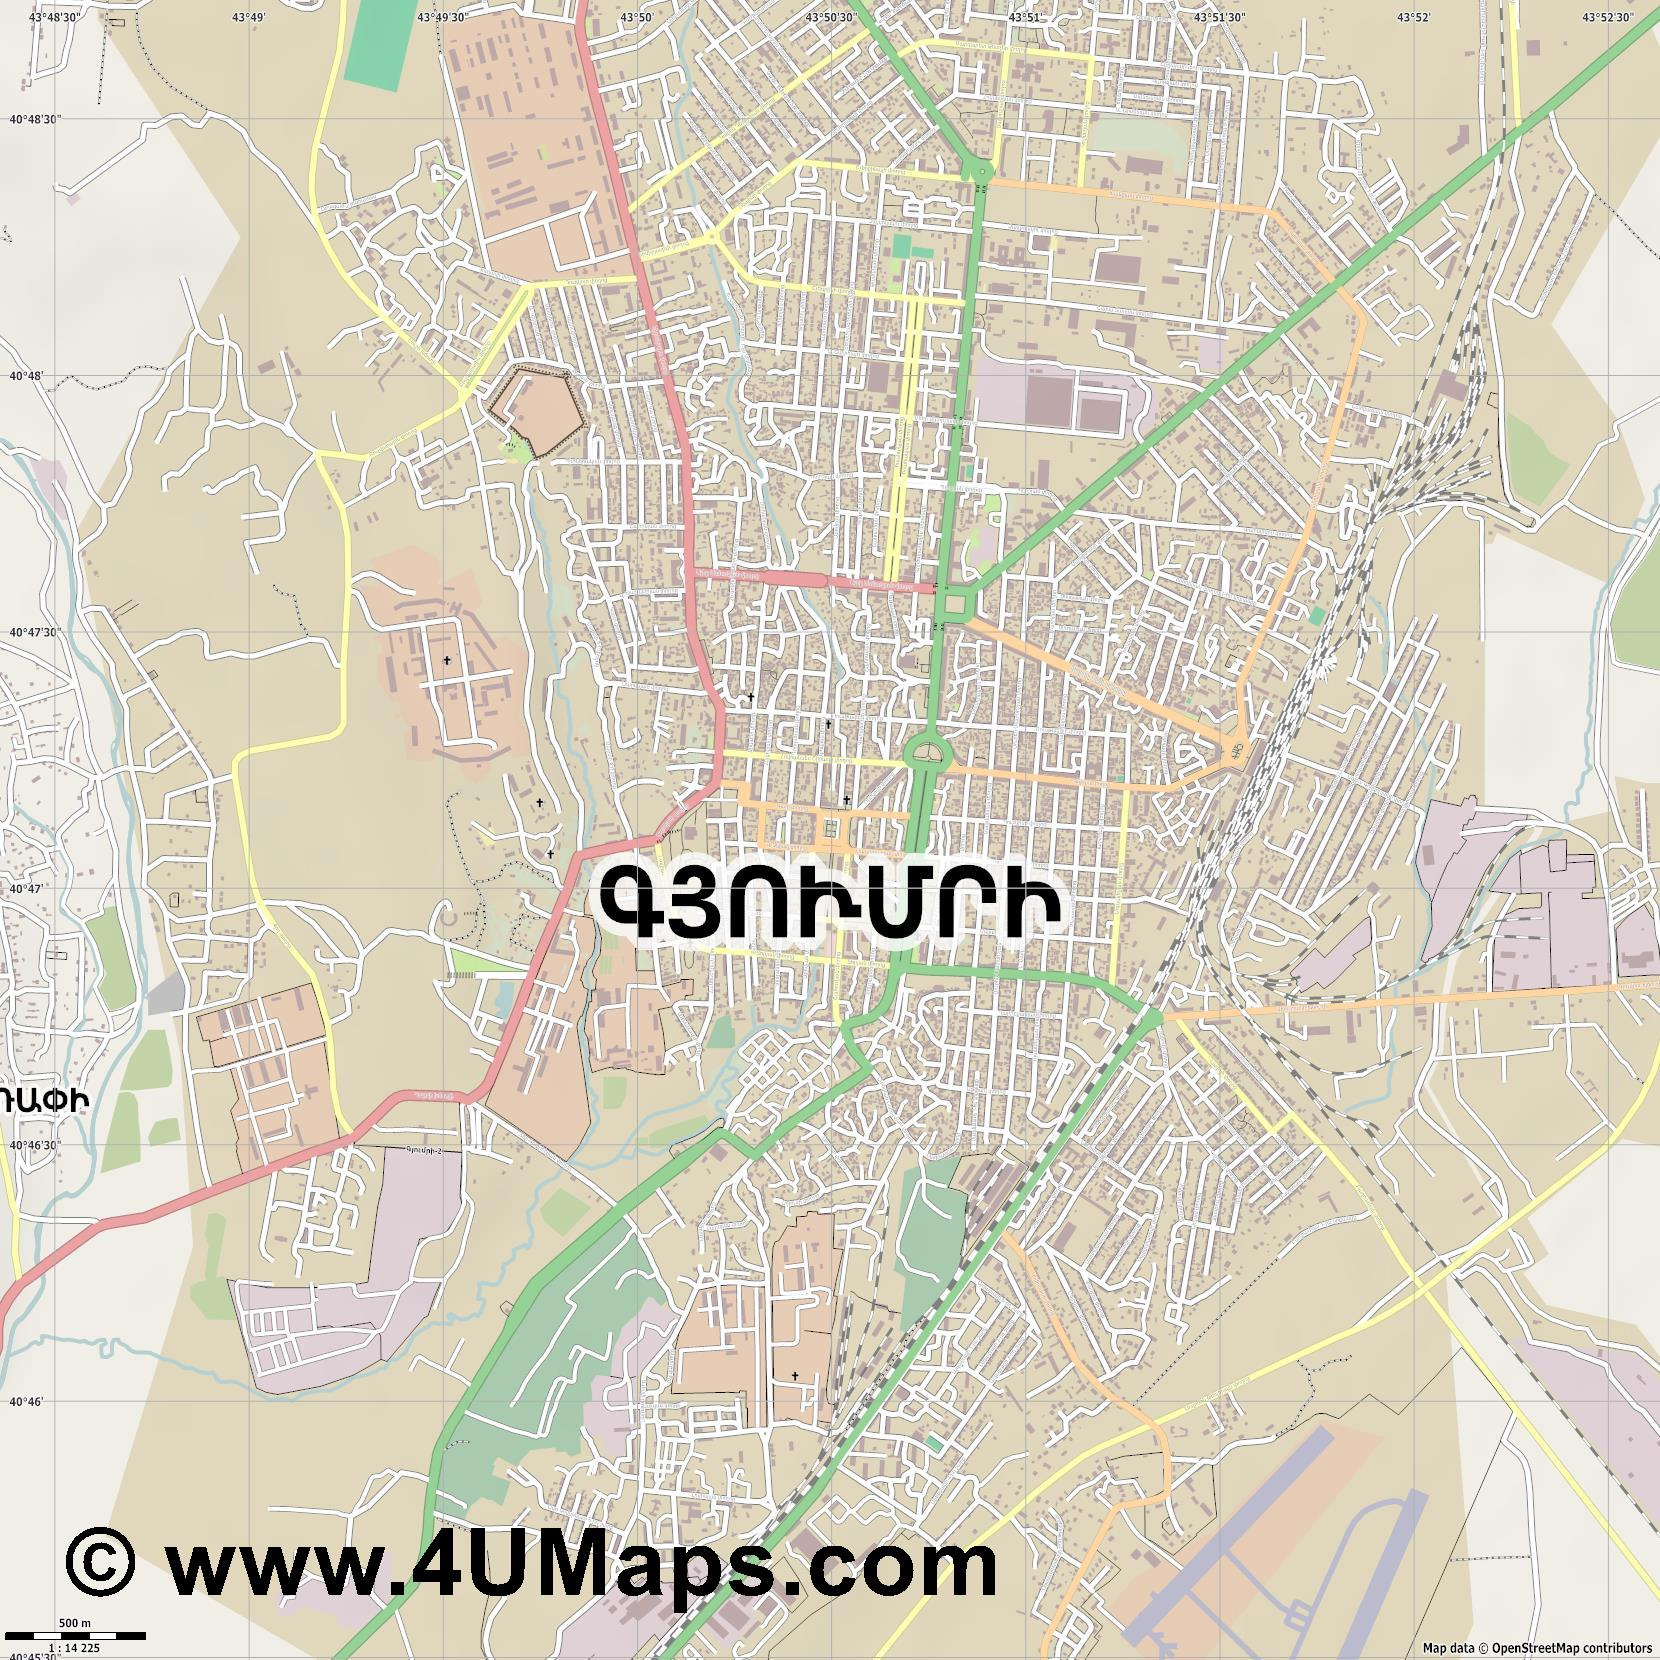 Svg Scalable Vector City Map Գյումրի - Gyumri map